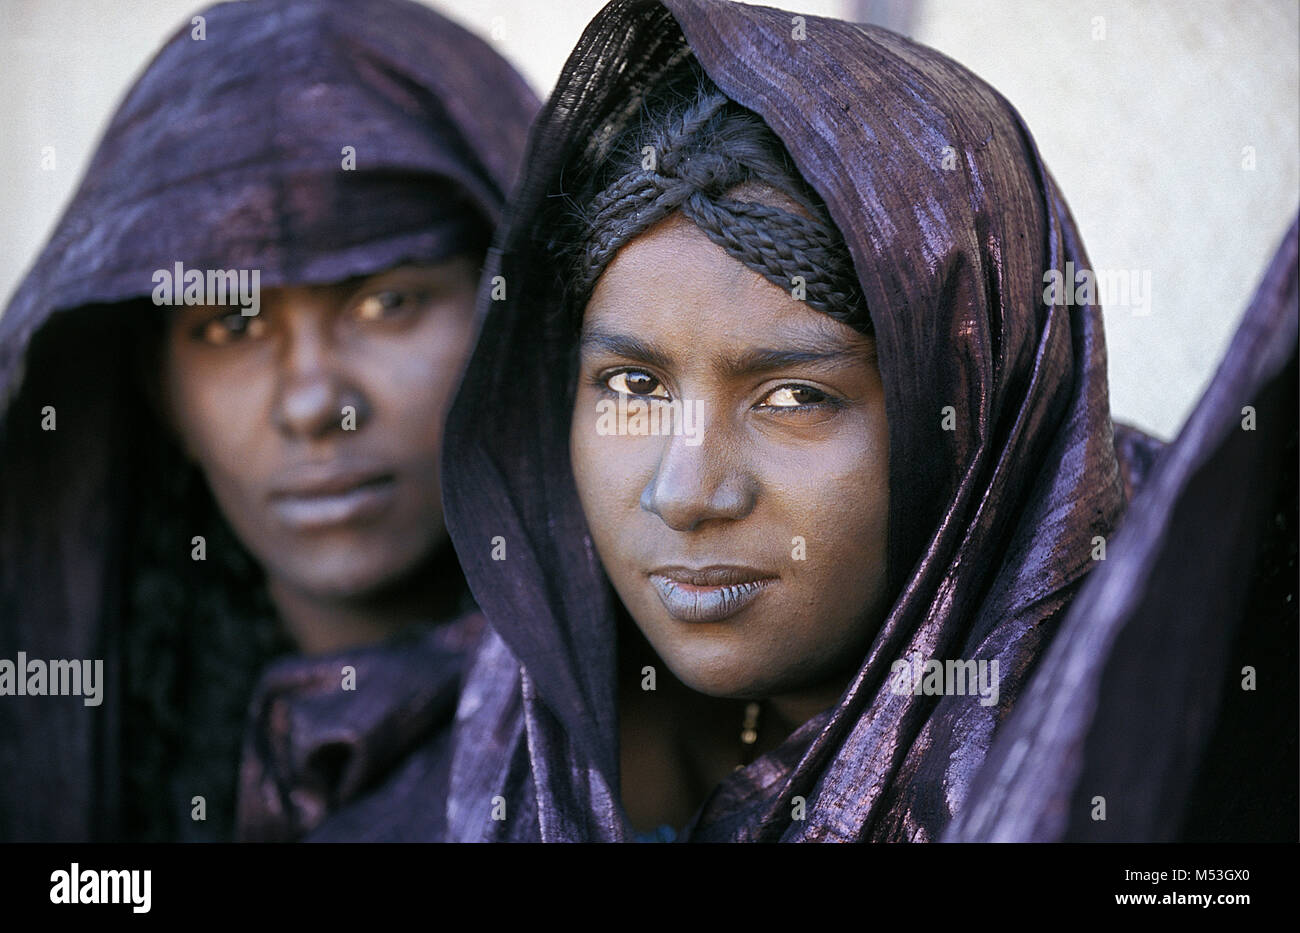 Alamy Stock Women amp; Tuareg De Imágenes Fotos nY8gxUP